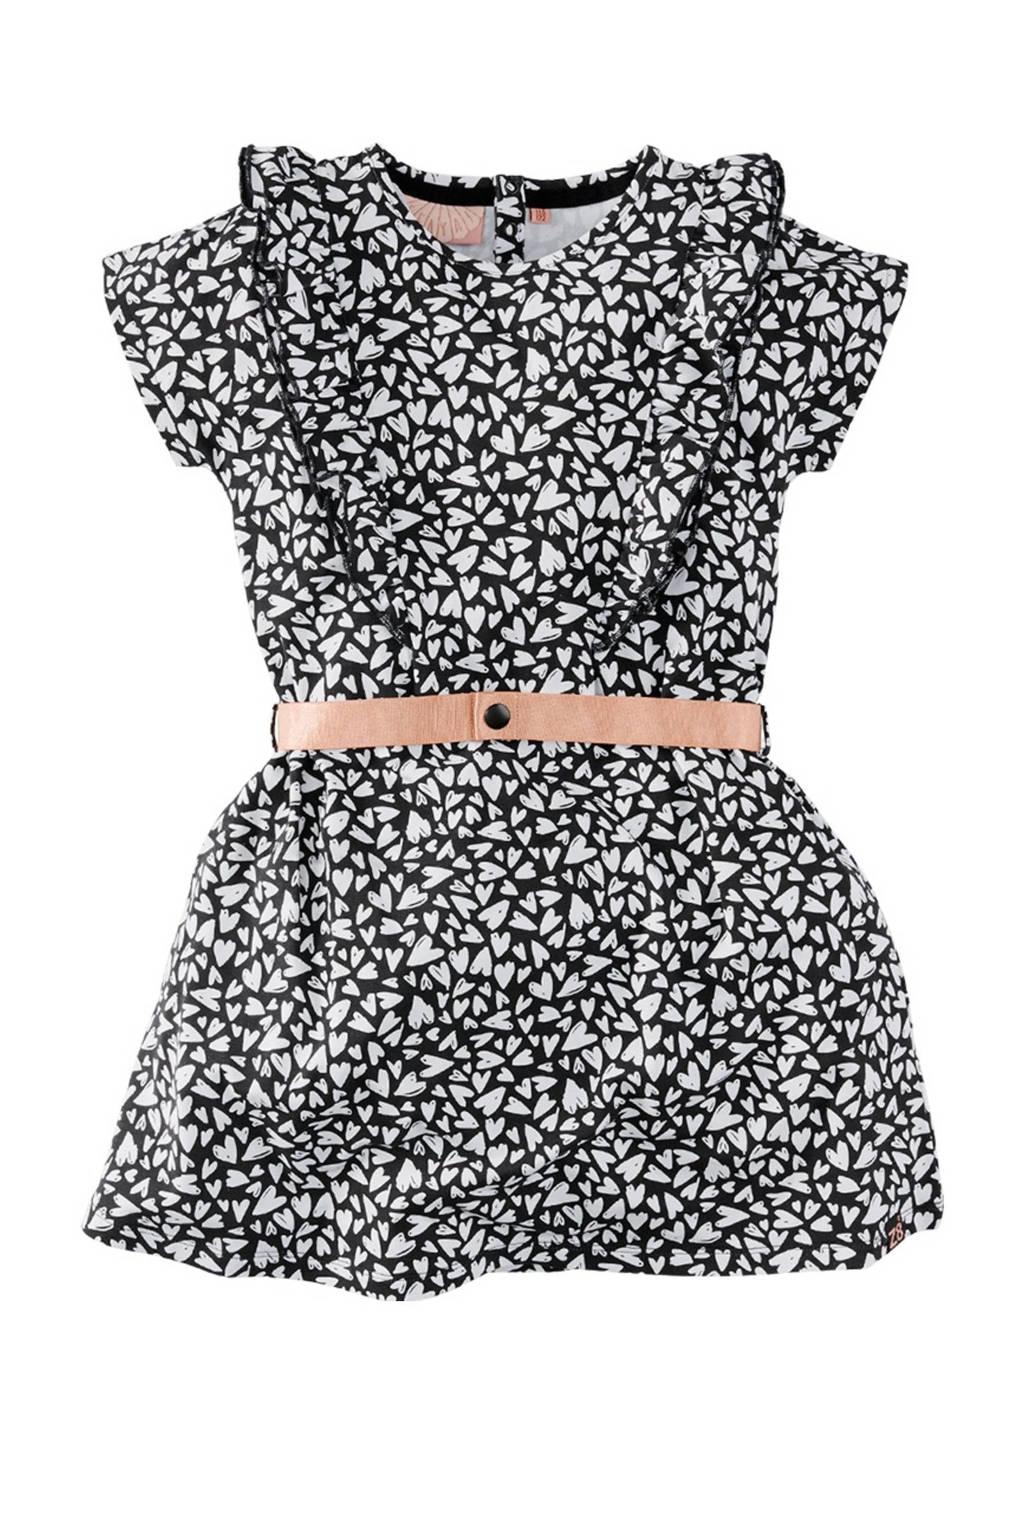 Z8 jurk Nana met all over print en ruches zwart/wit, Zwart/wit